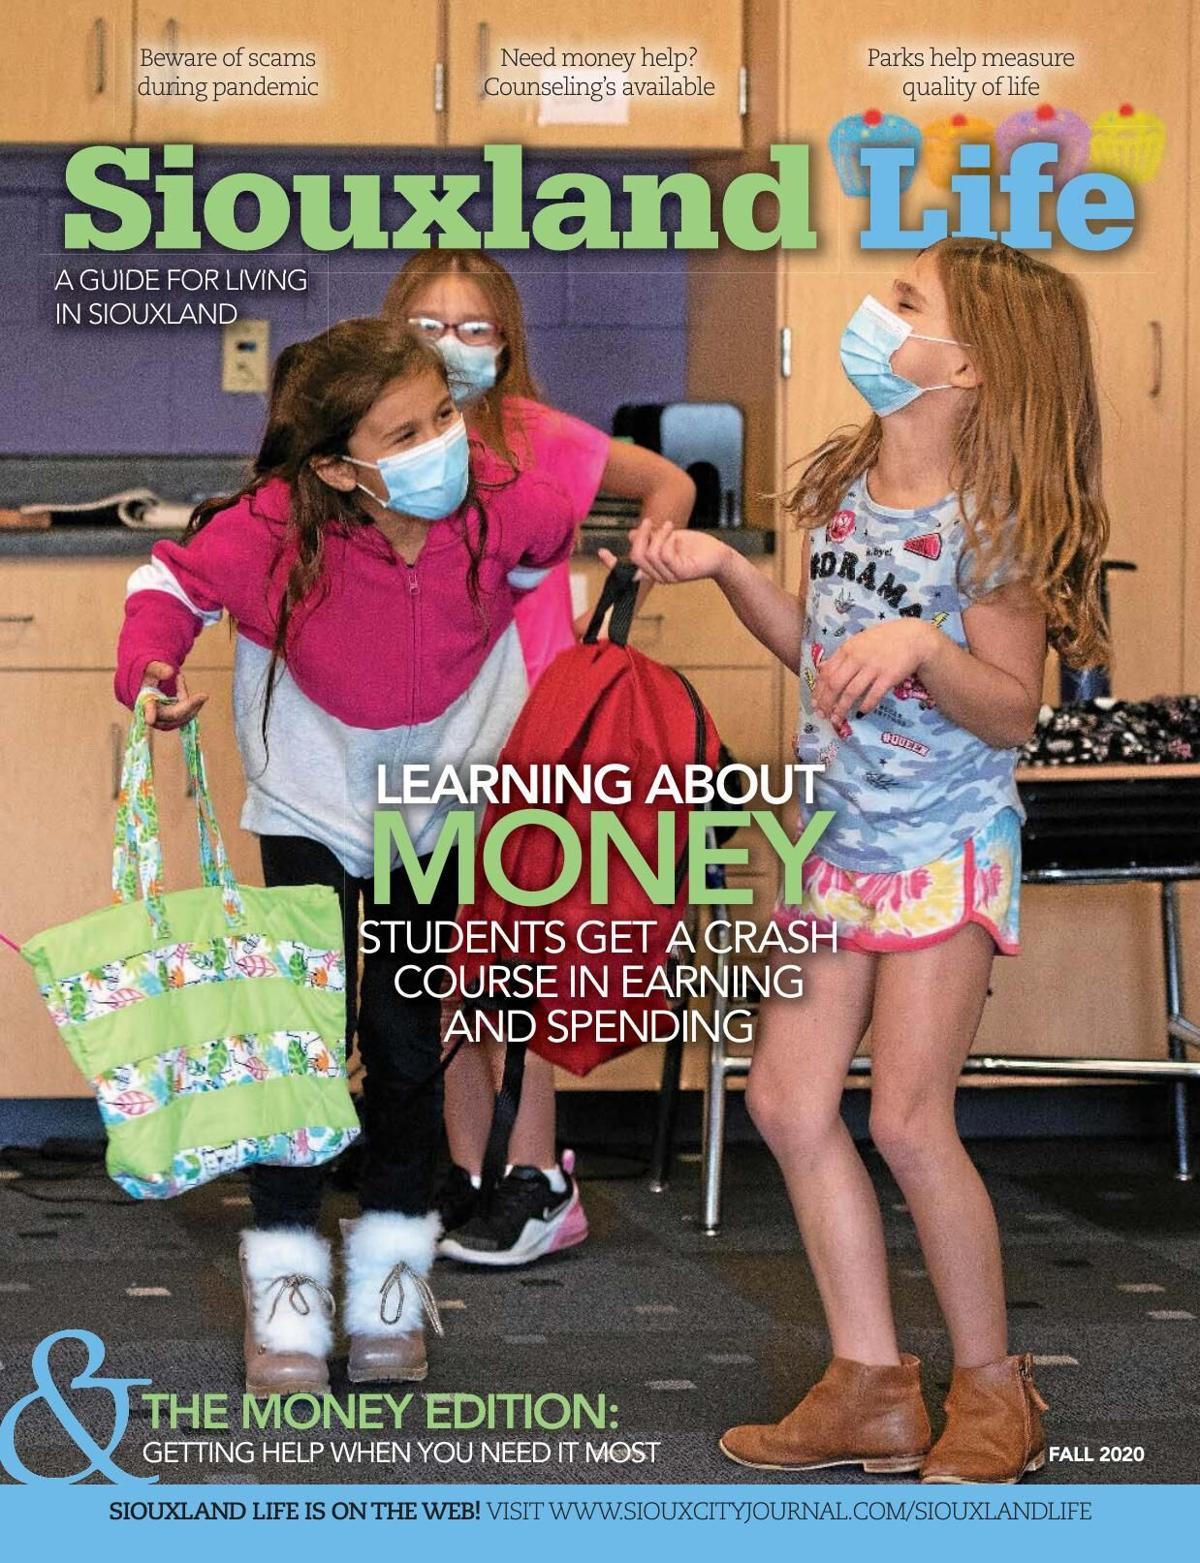 Siouxland Life - Fall 2020